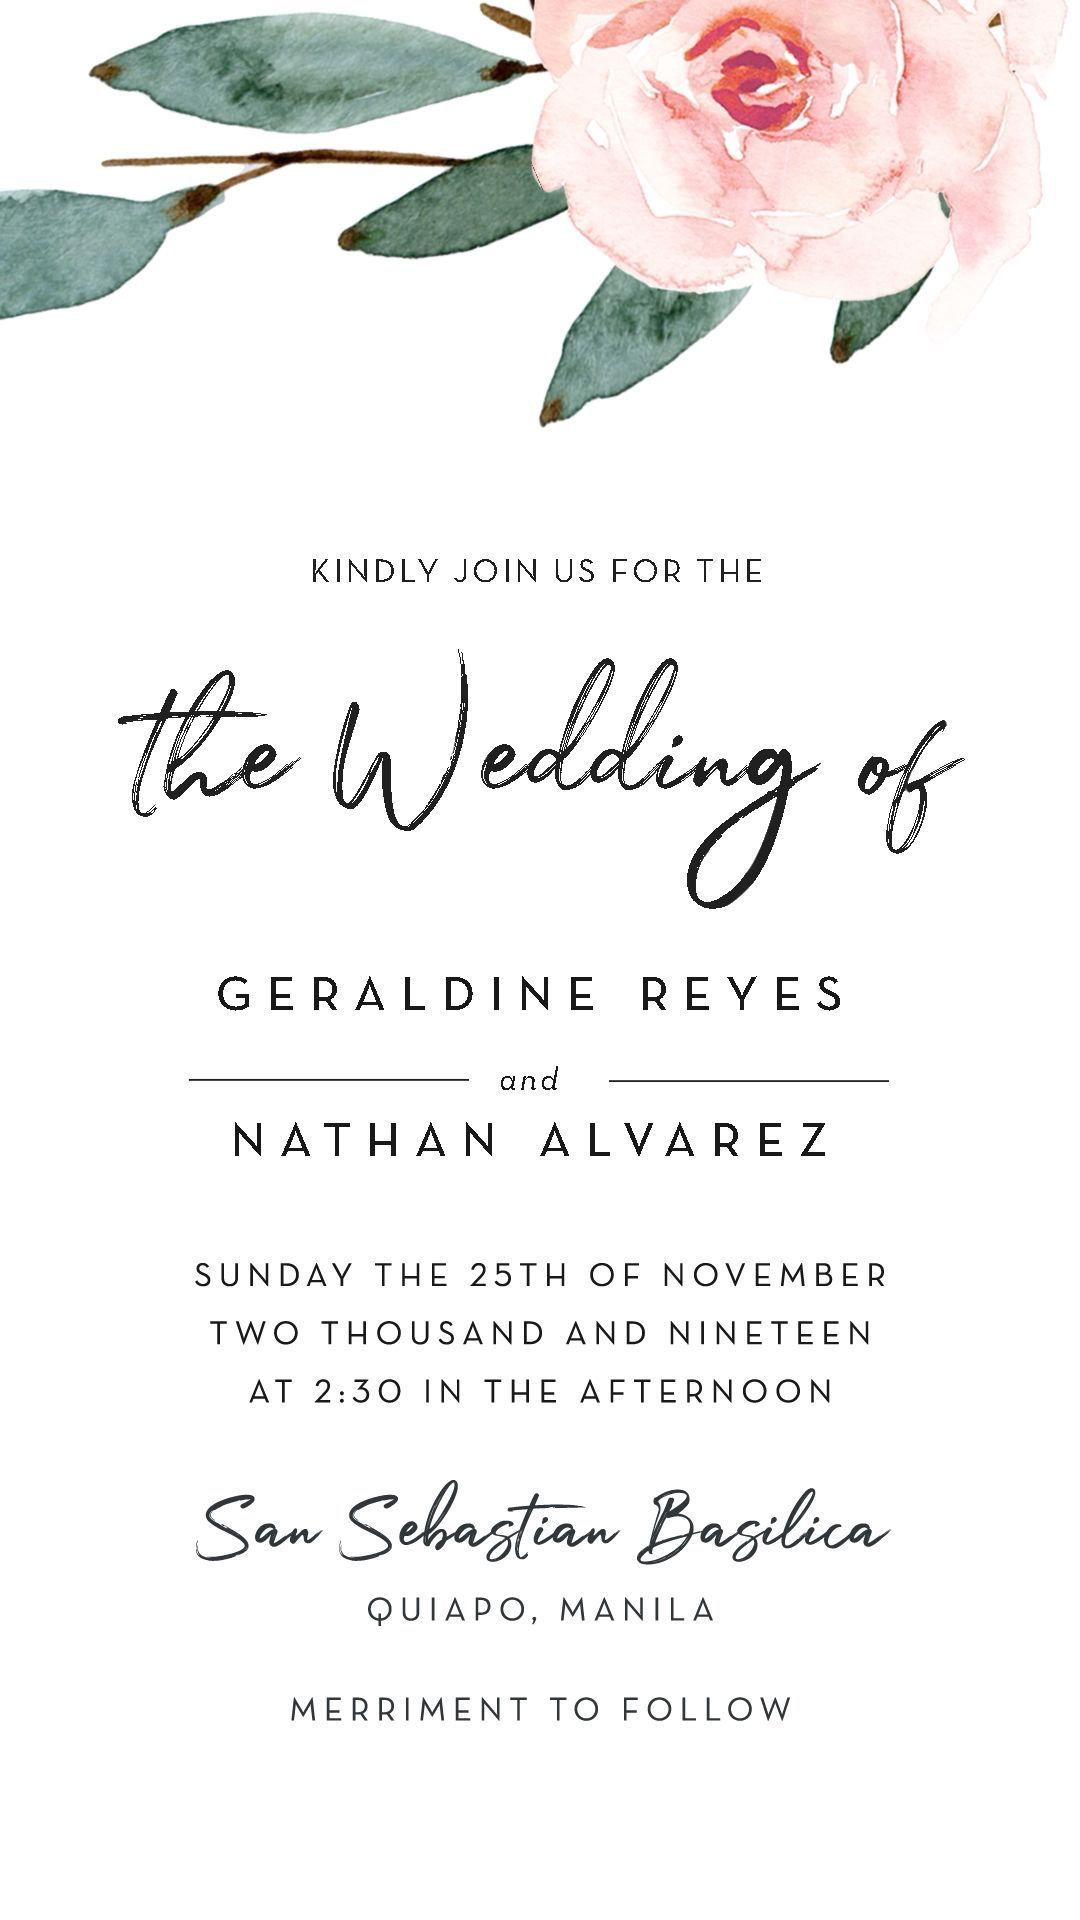 Logo Discover Minimalist Floral Save The Date Wedding Video Invitation In 2020 Wedding Invitation Video Wedding Invitation Card Design Electronic Wedding Invitations